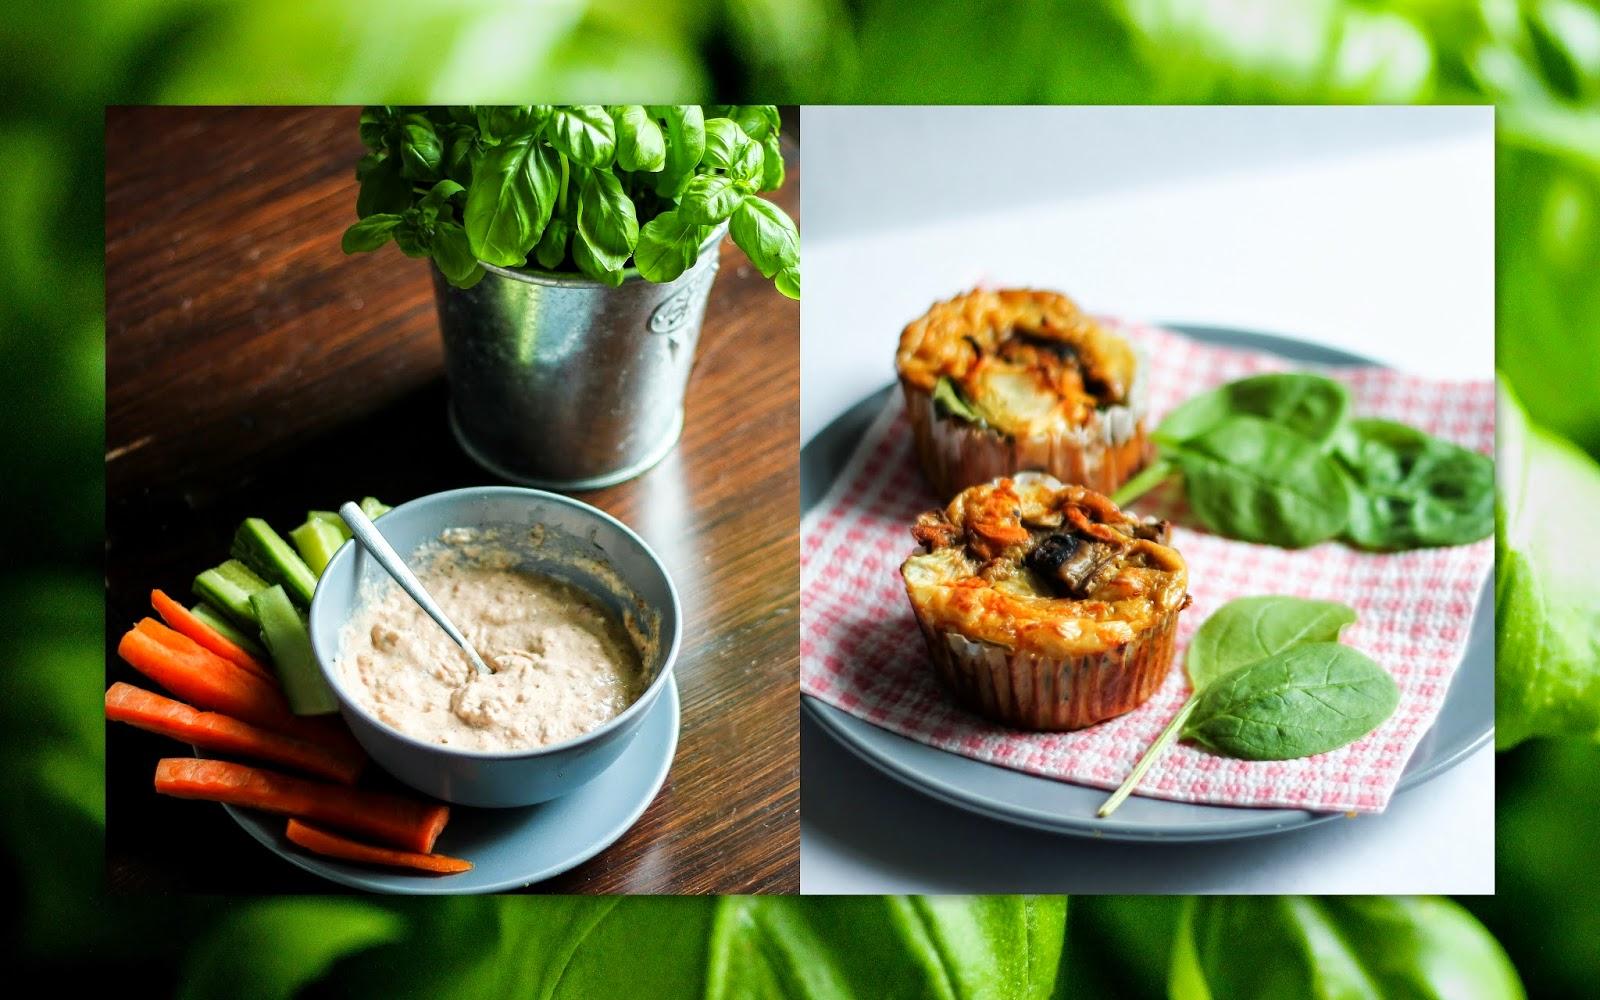 FOOD: TUNA DIP WITH EGG MUFFINS PRIZMAHFASHION